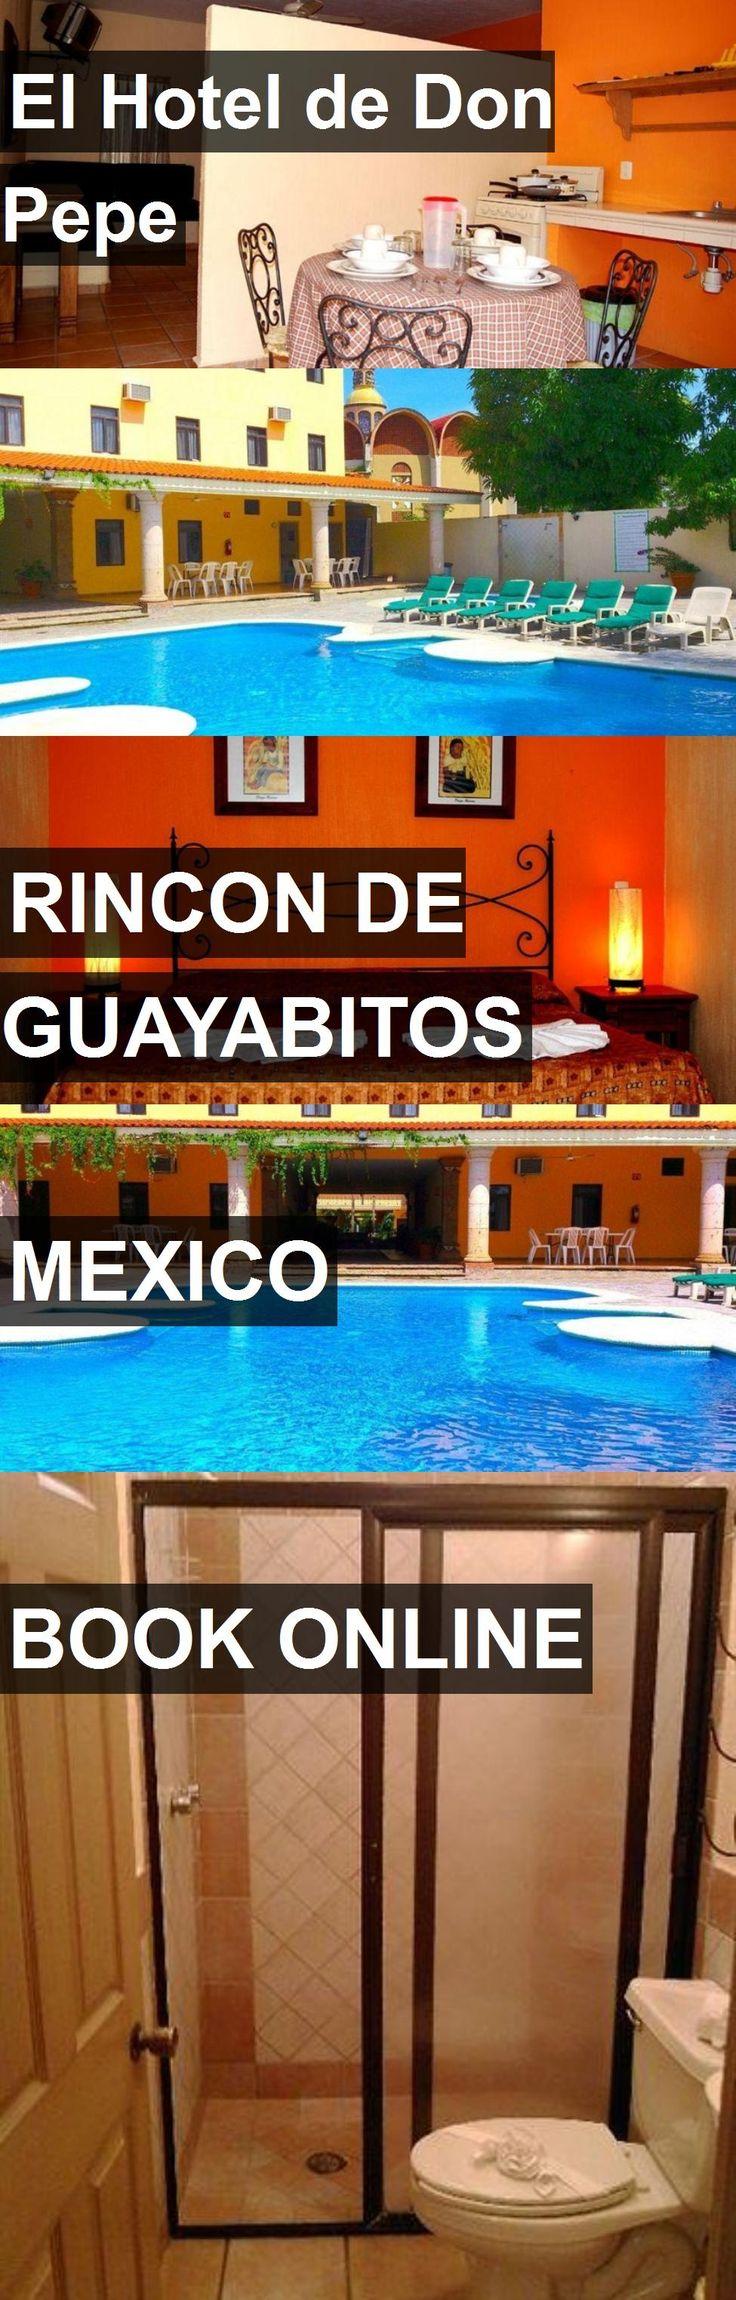 El Hotel de Don Pepe in Rincon de Guayabitos, Mexico. For more information, photos, reviews and best prices please follow the link. #Mexico #RincondeGuayabitos #travel #vacation #hotel